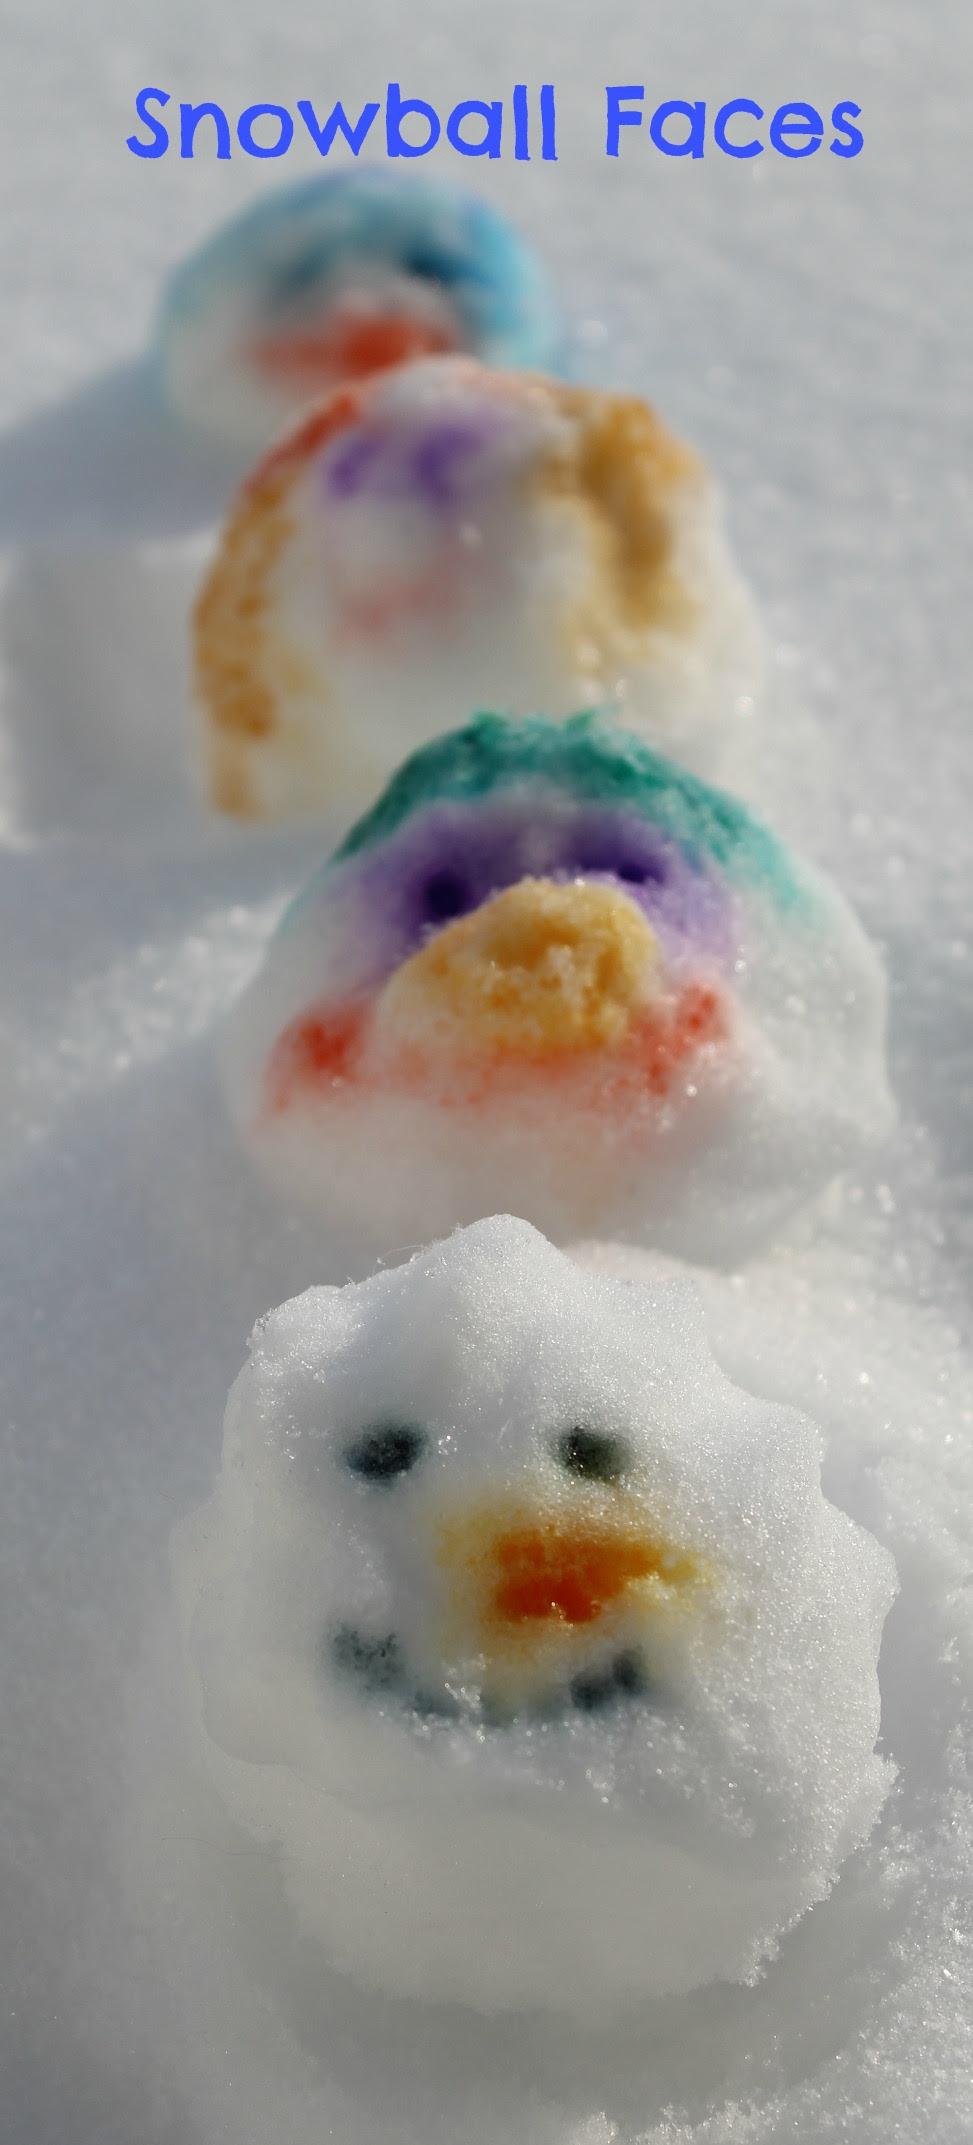 http://www.fantasticfunandlearning.com/indoor-snow-activity.html